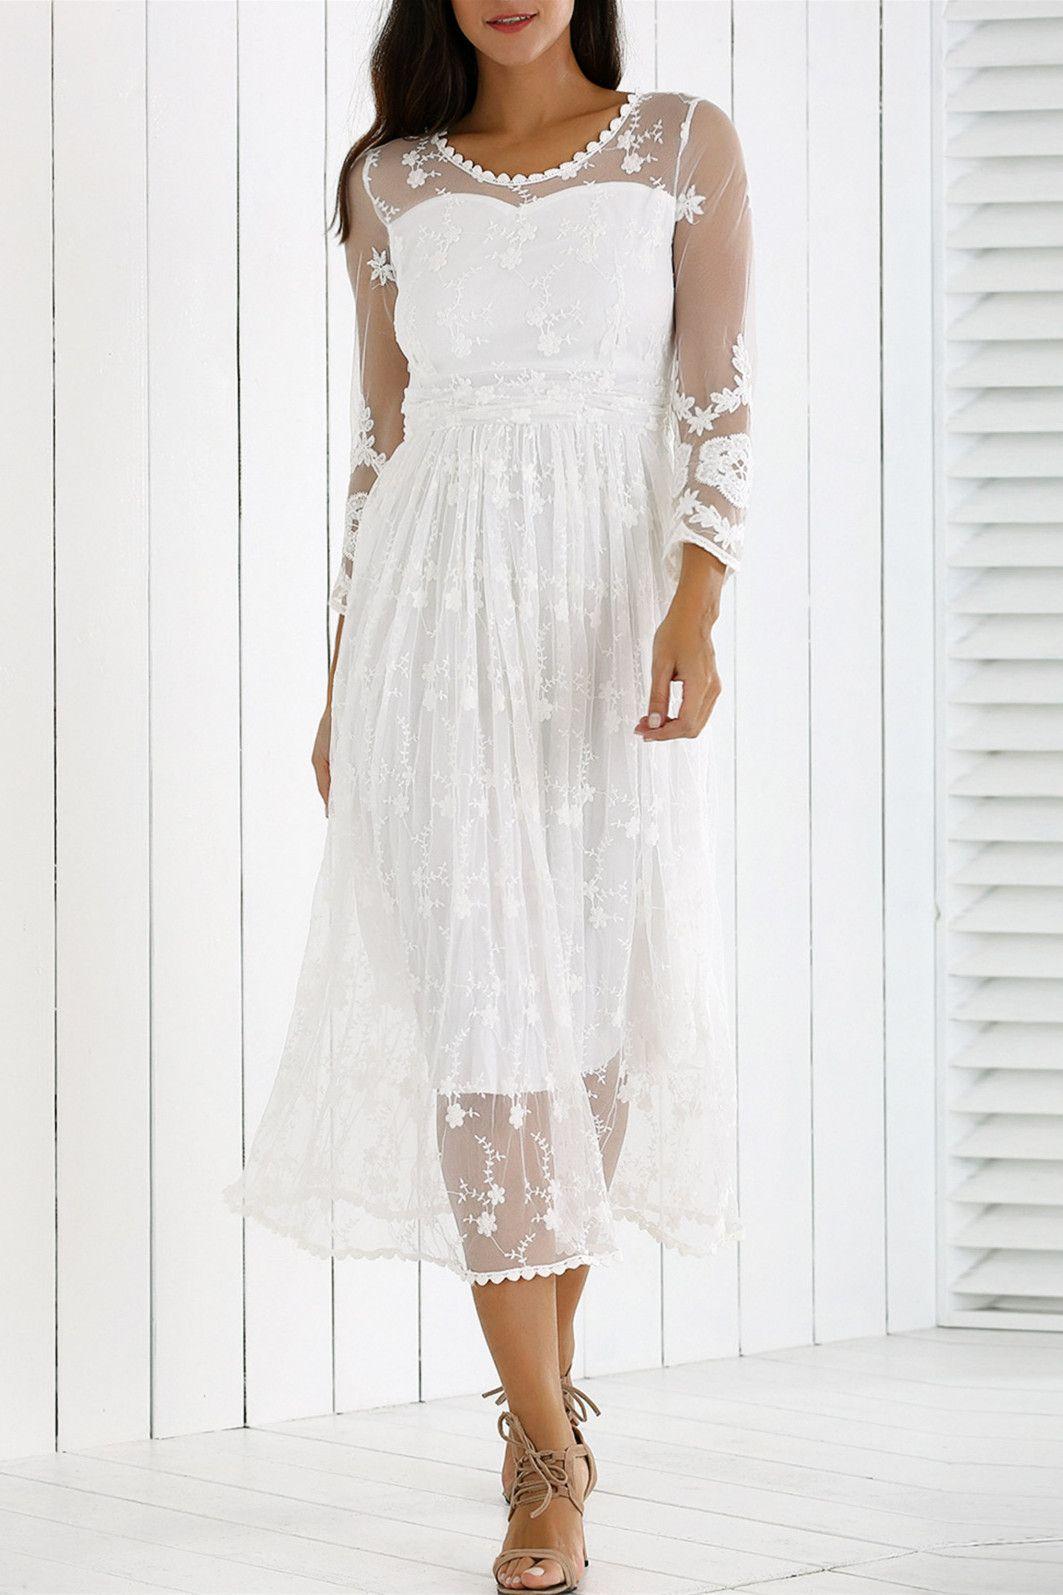 29 26 Guipure Mesh Laciness Dress White Clothes Pinterest